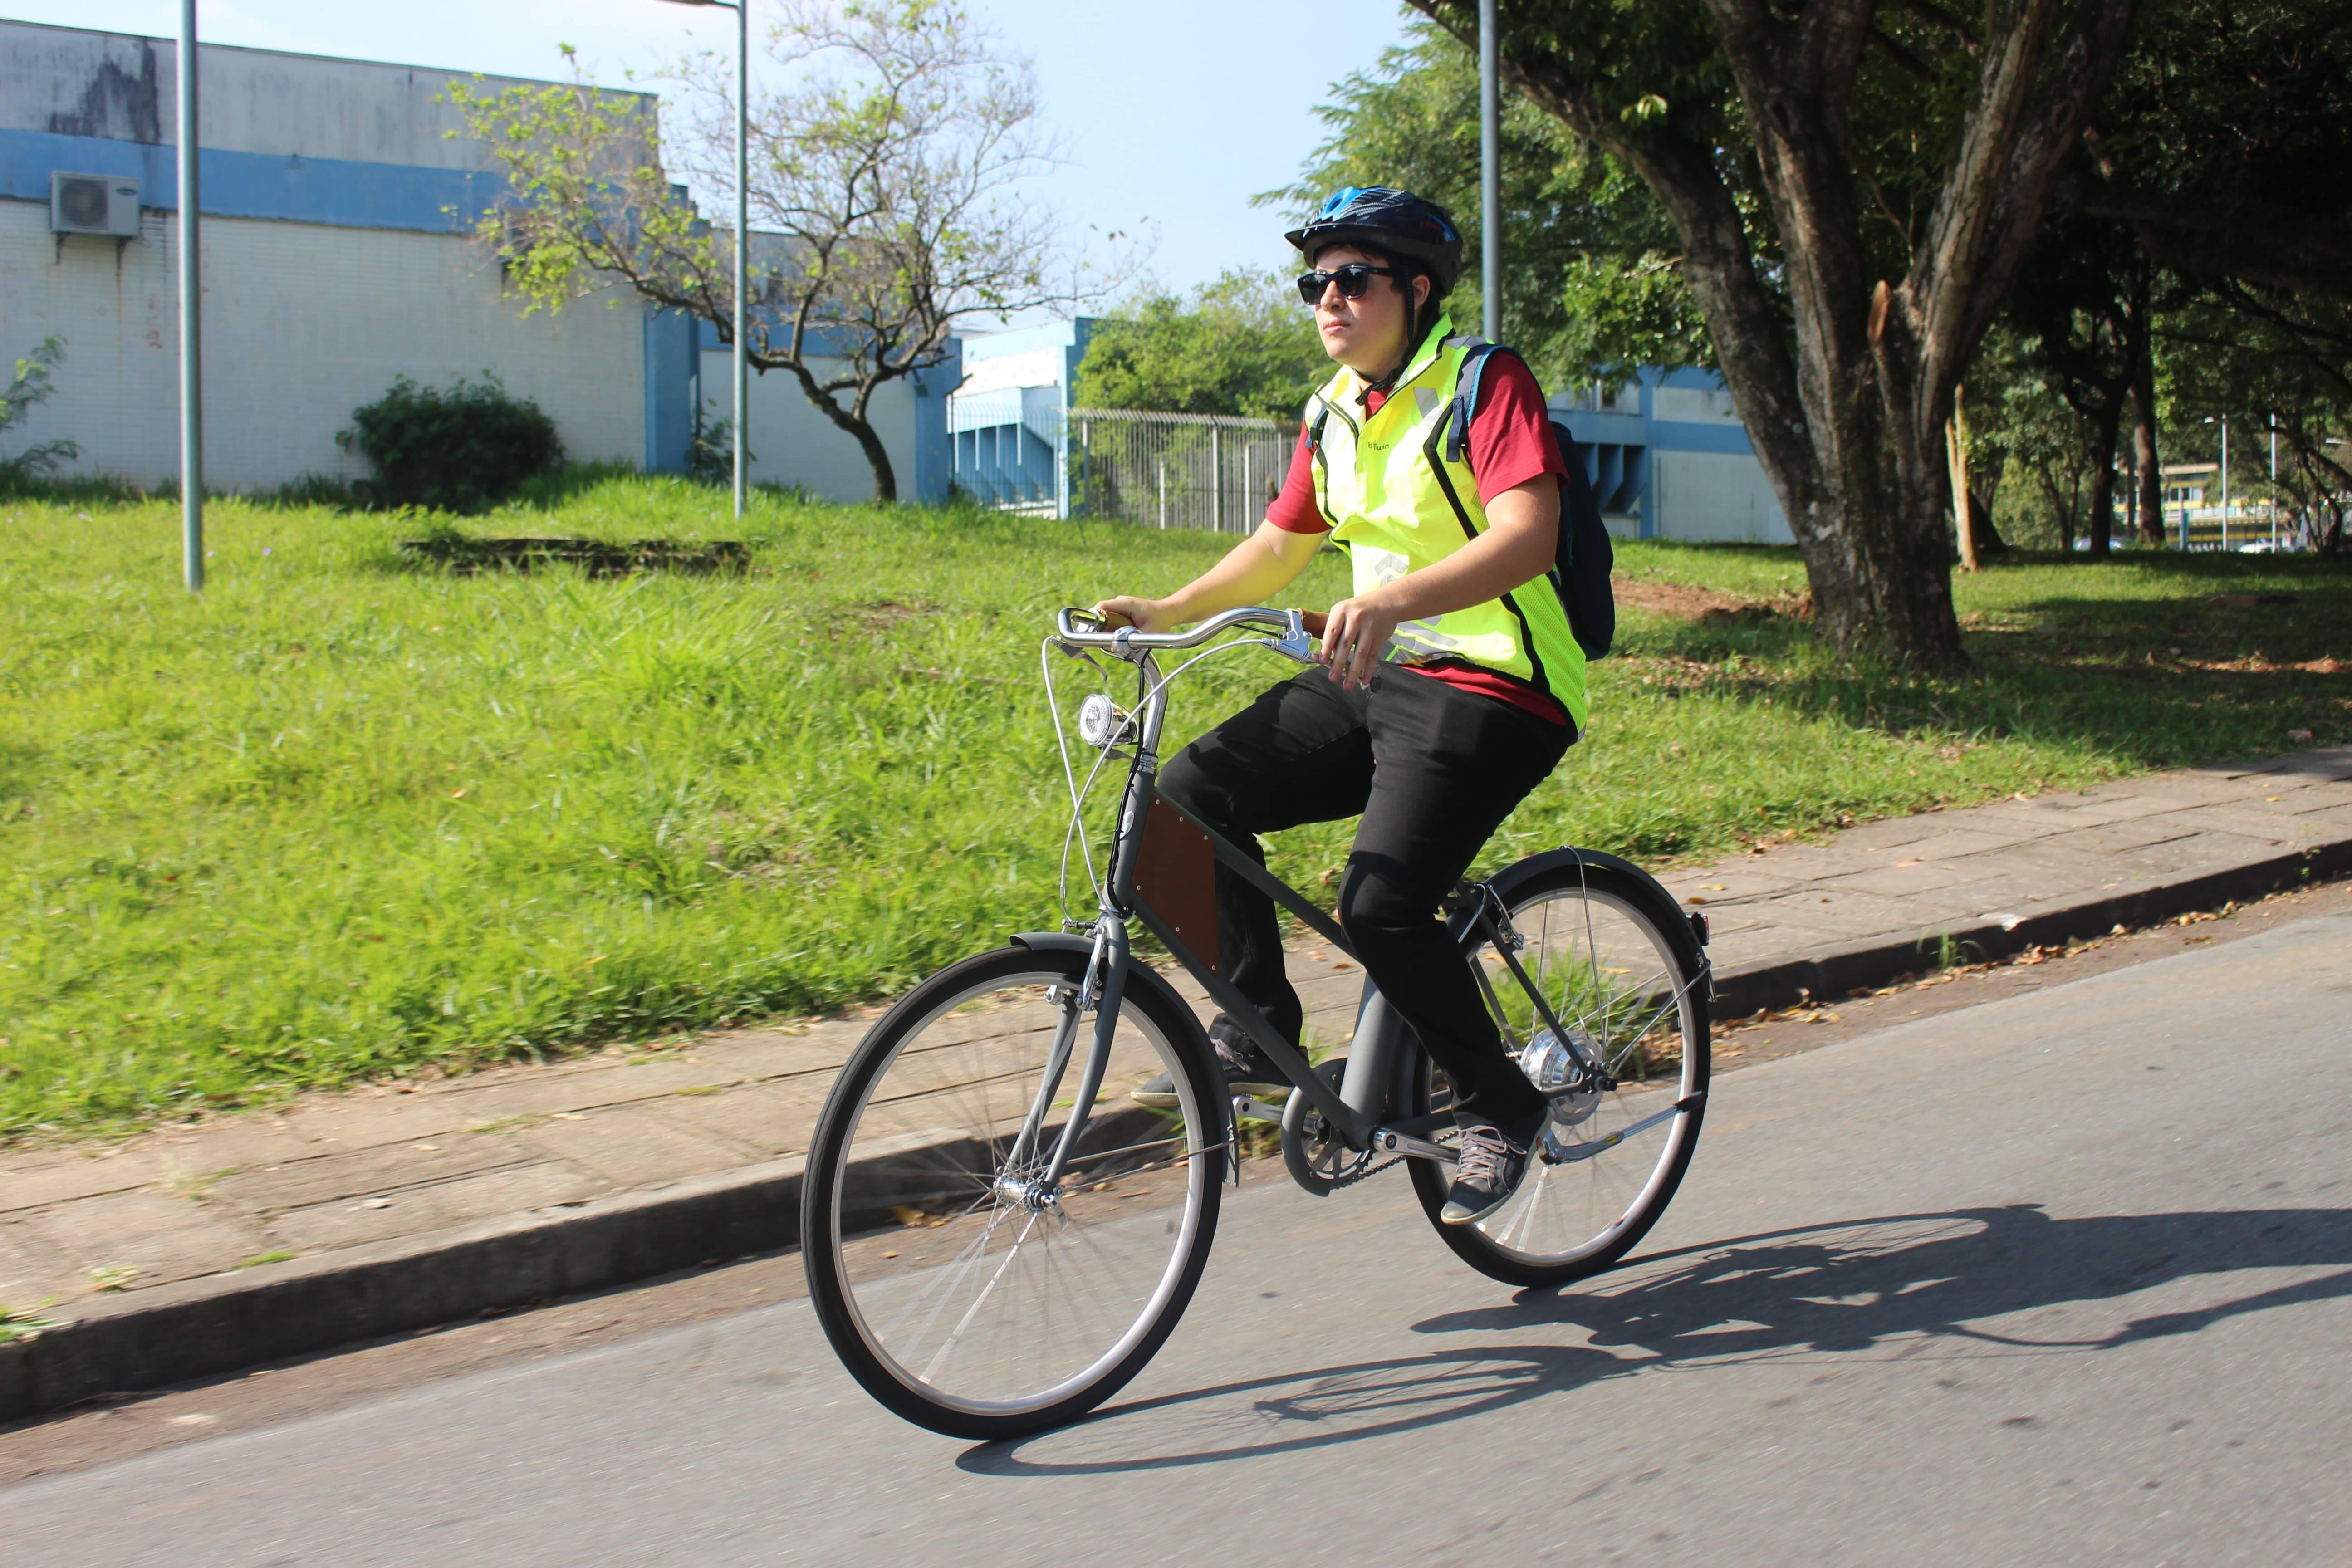 Bike elétrica. Foto: Cauê Lira/iG Carros